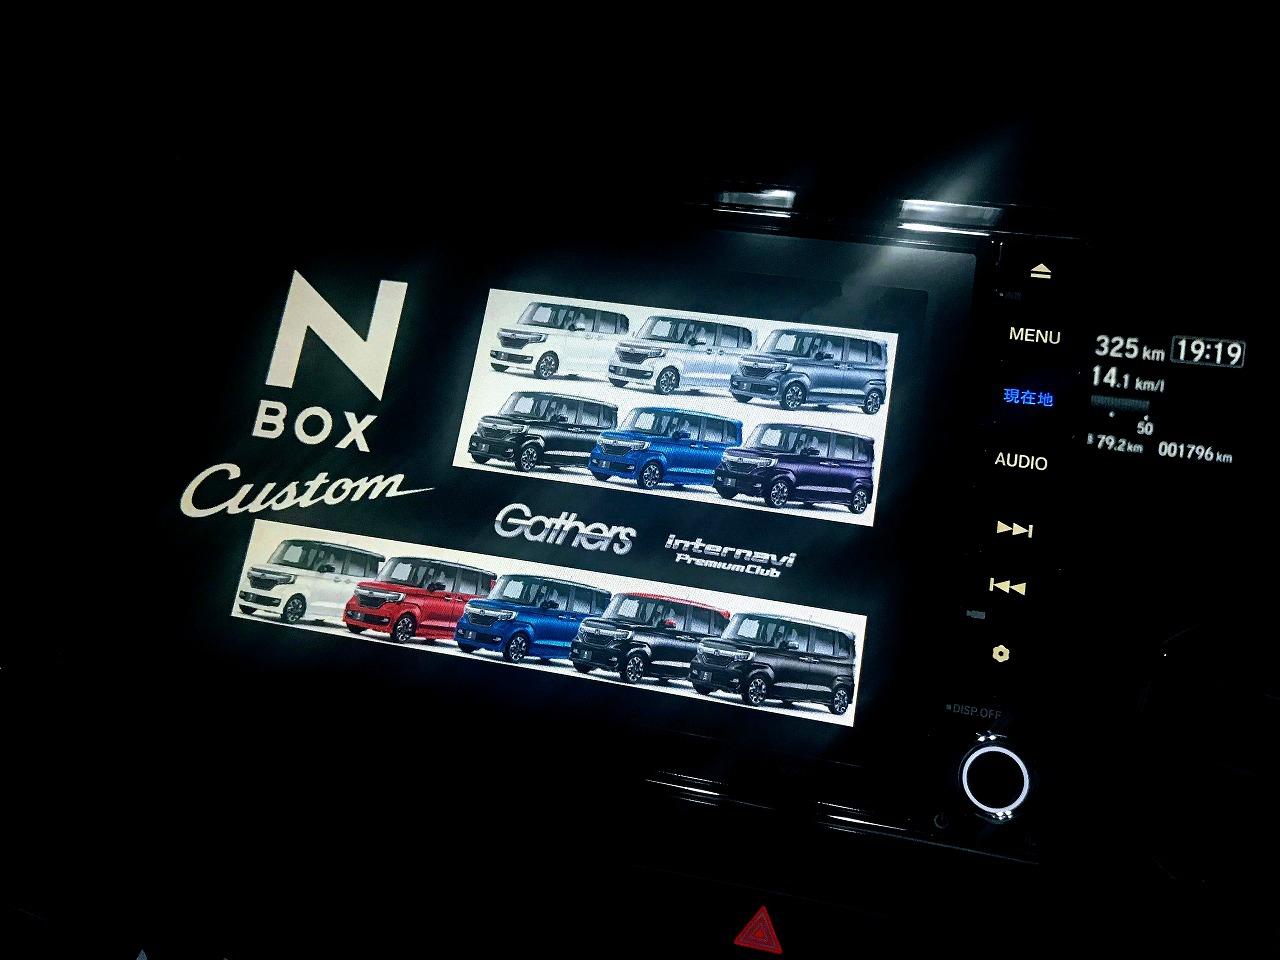 N-BOXの純正ギャザスナビの起動時オープニング画面を自作して変更してみました^^